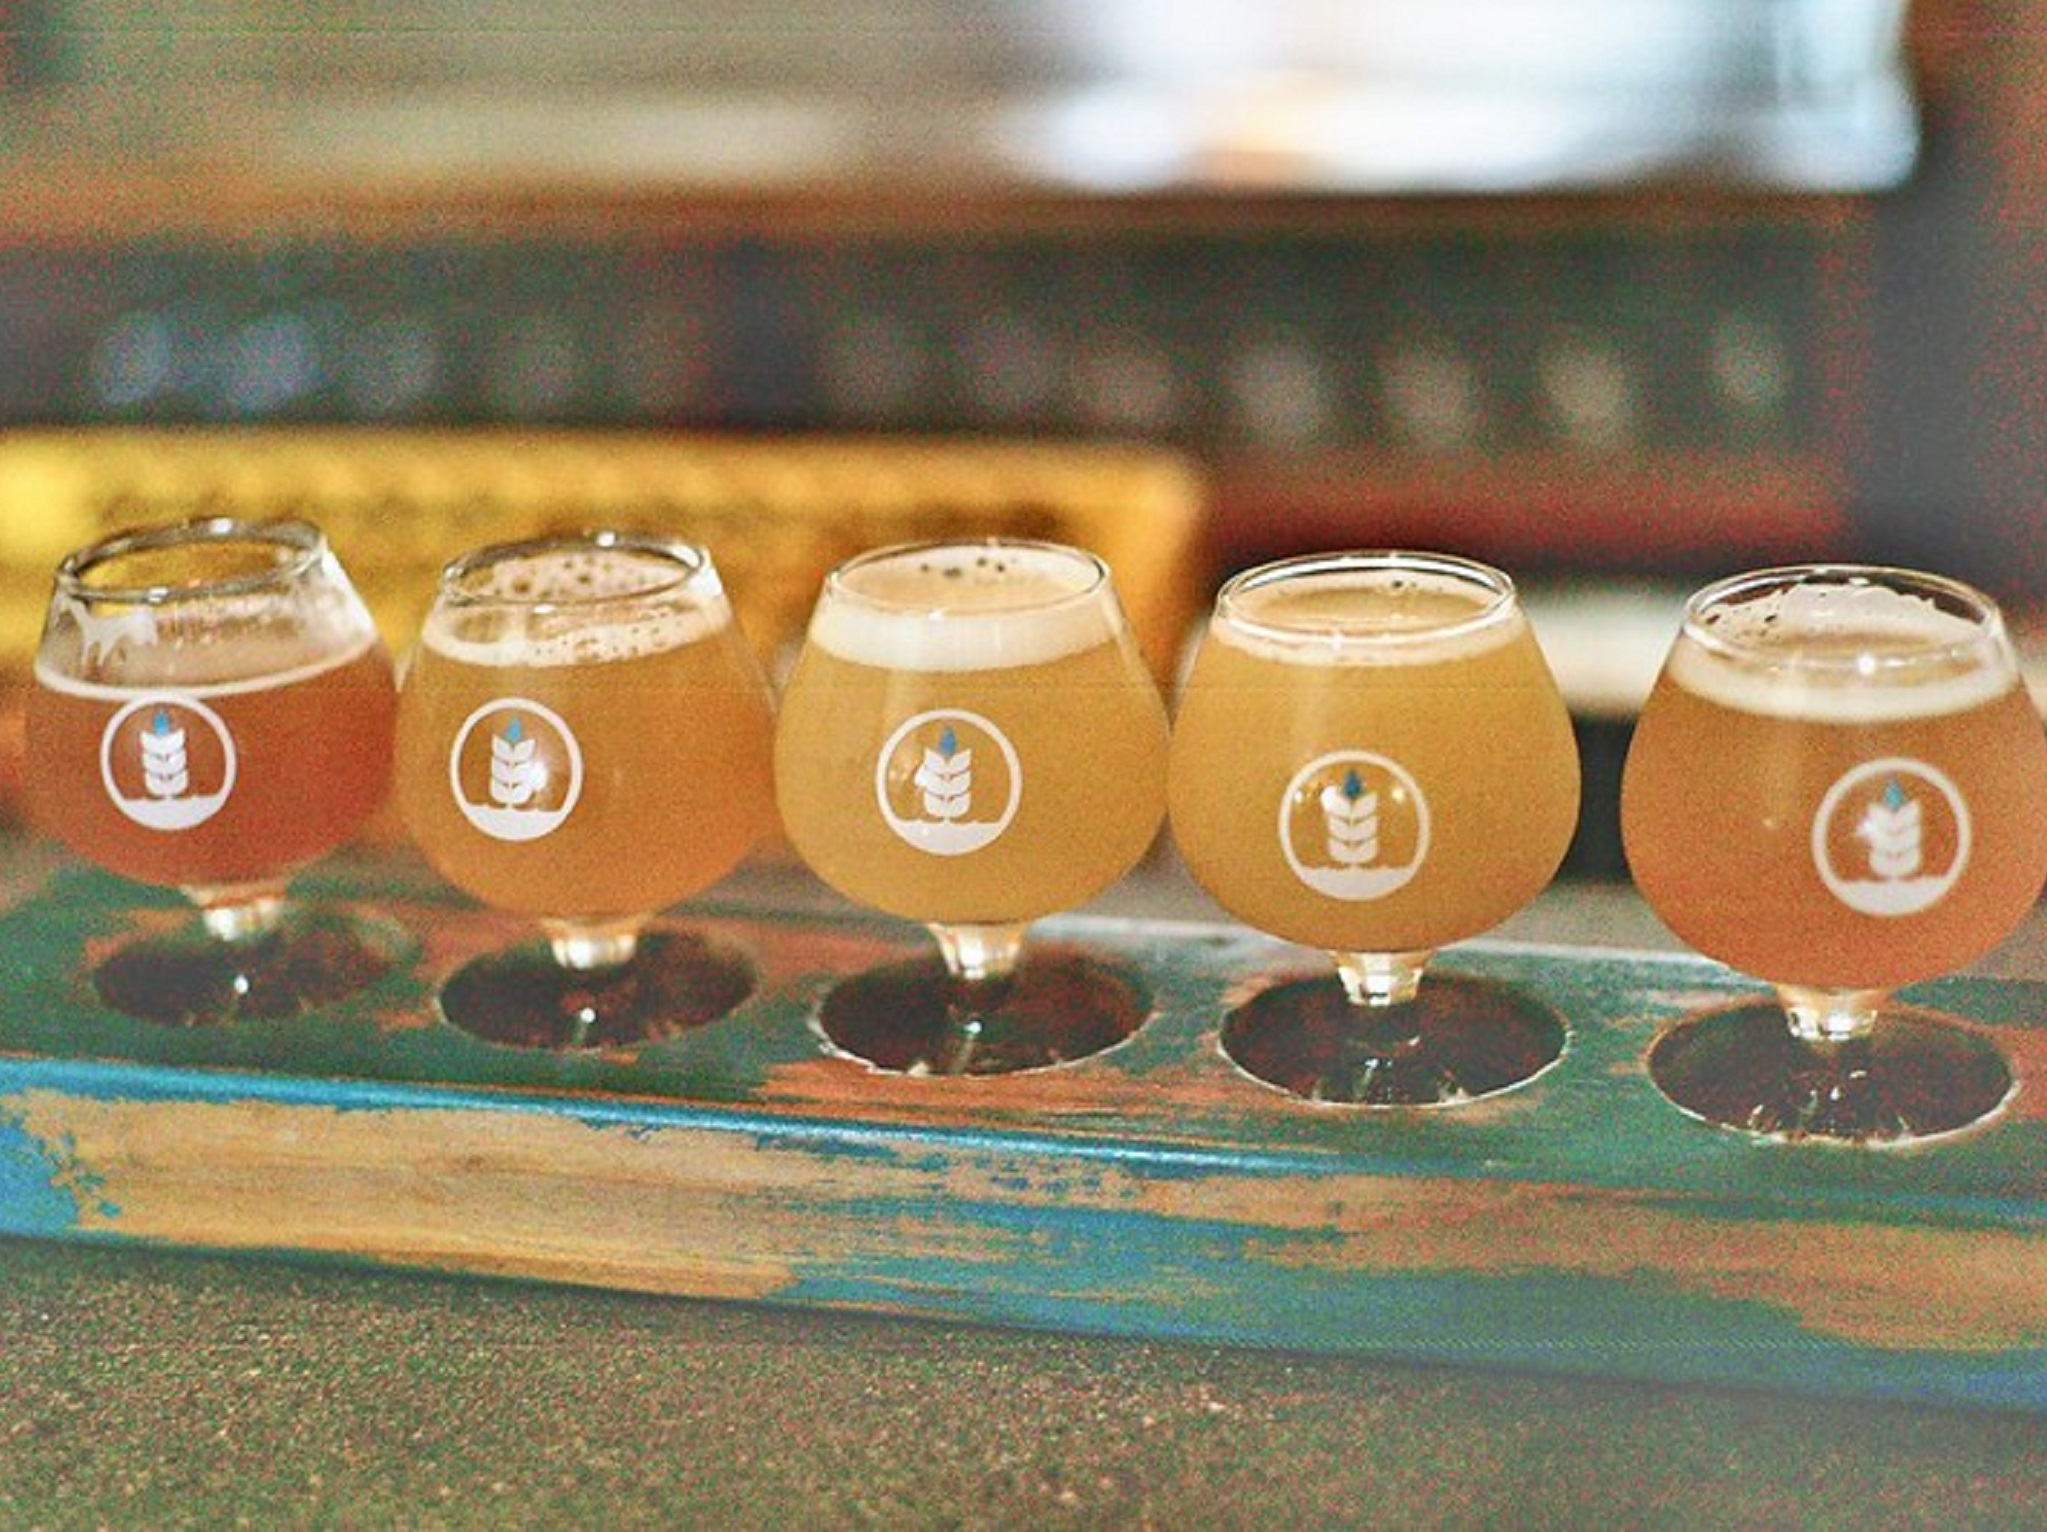 Five tasters of beer on a blue board